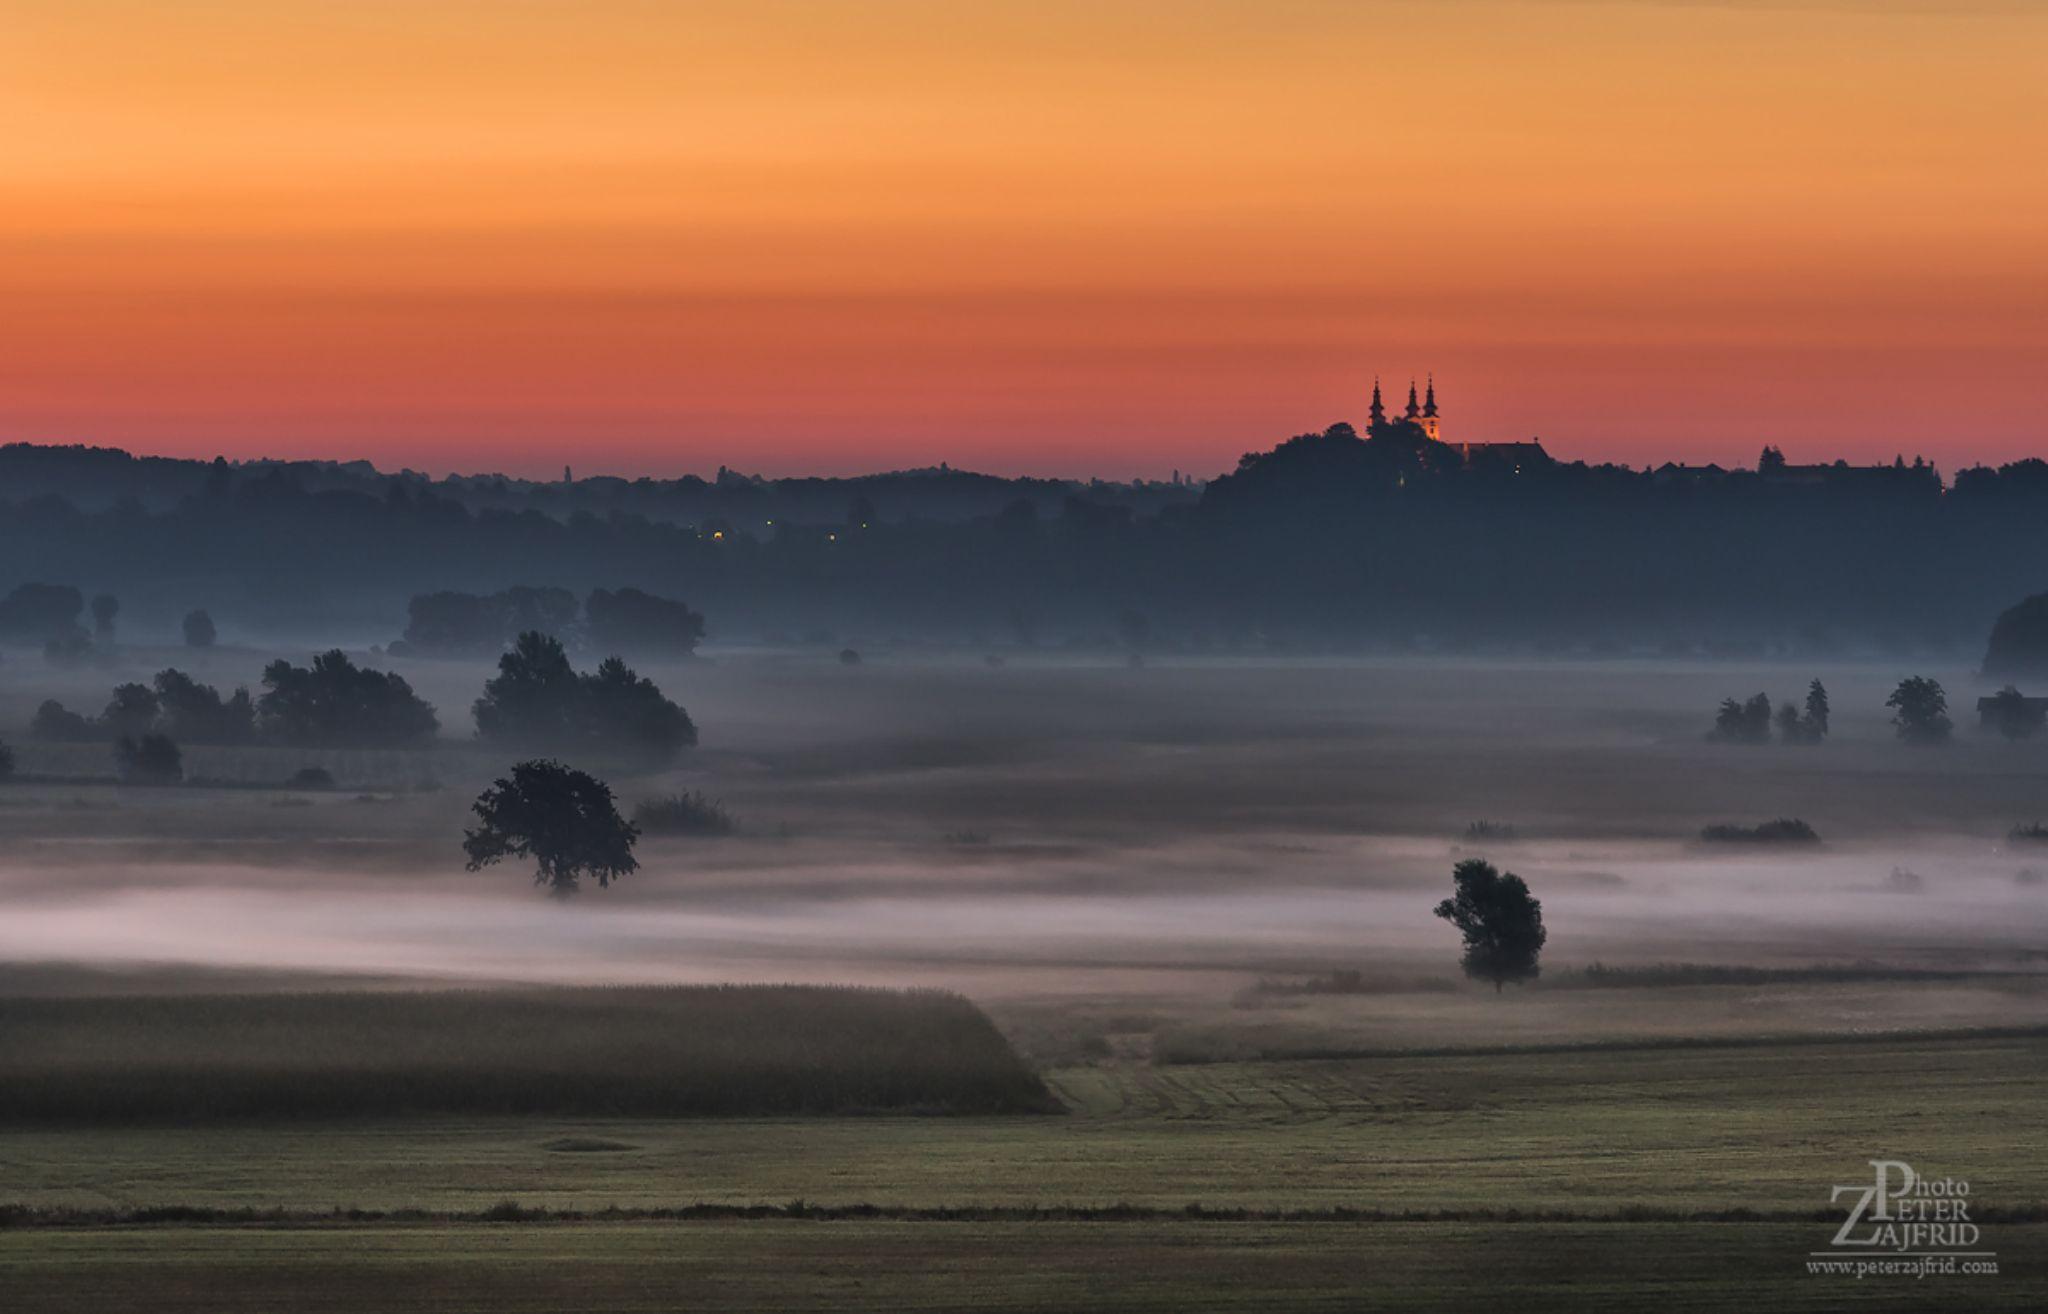 Enter the dawn by Peter Zajfrid